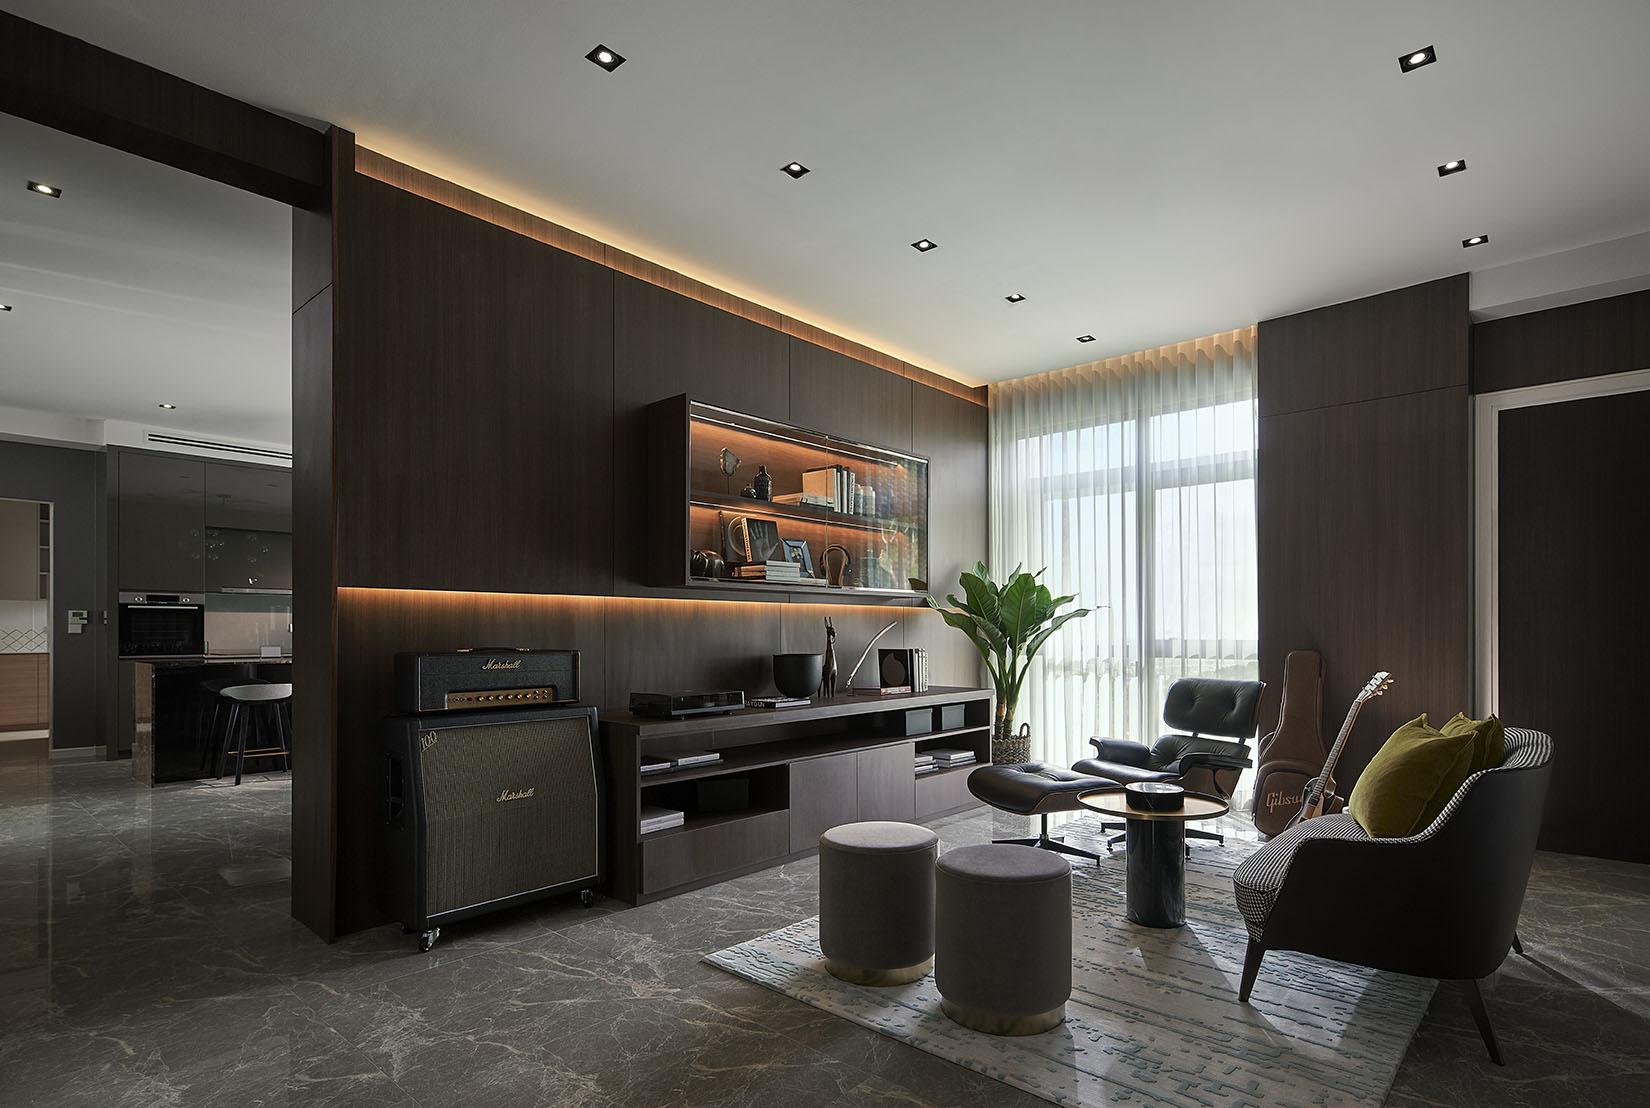 park regent malaysia apartment living room - Luxe Digital